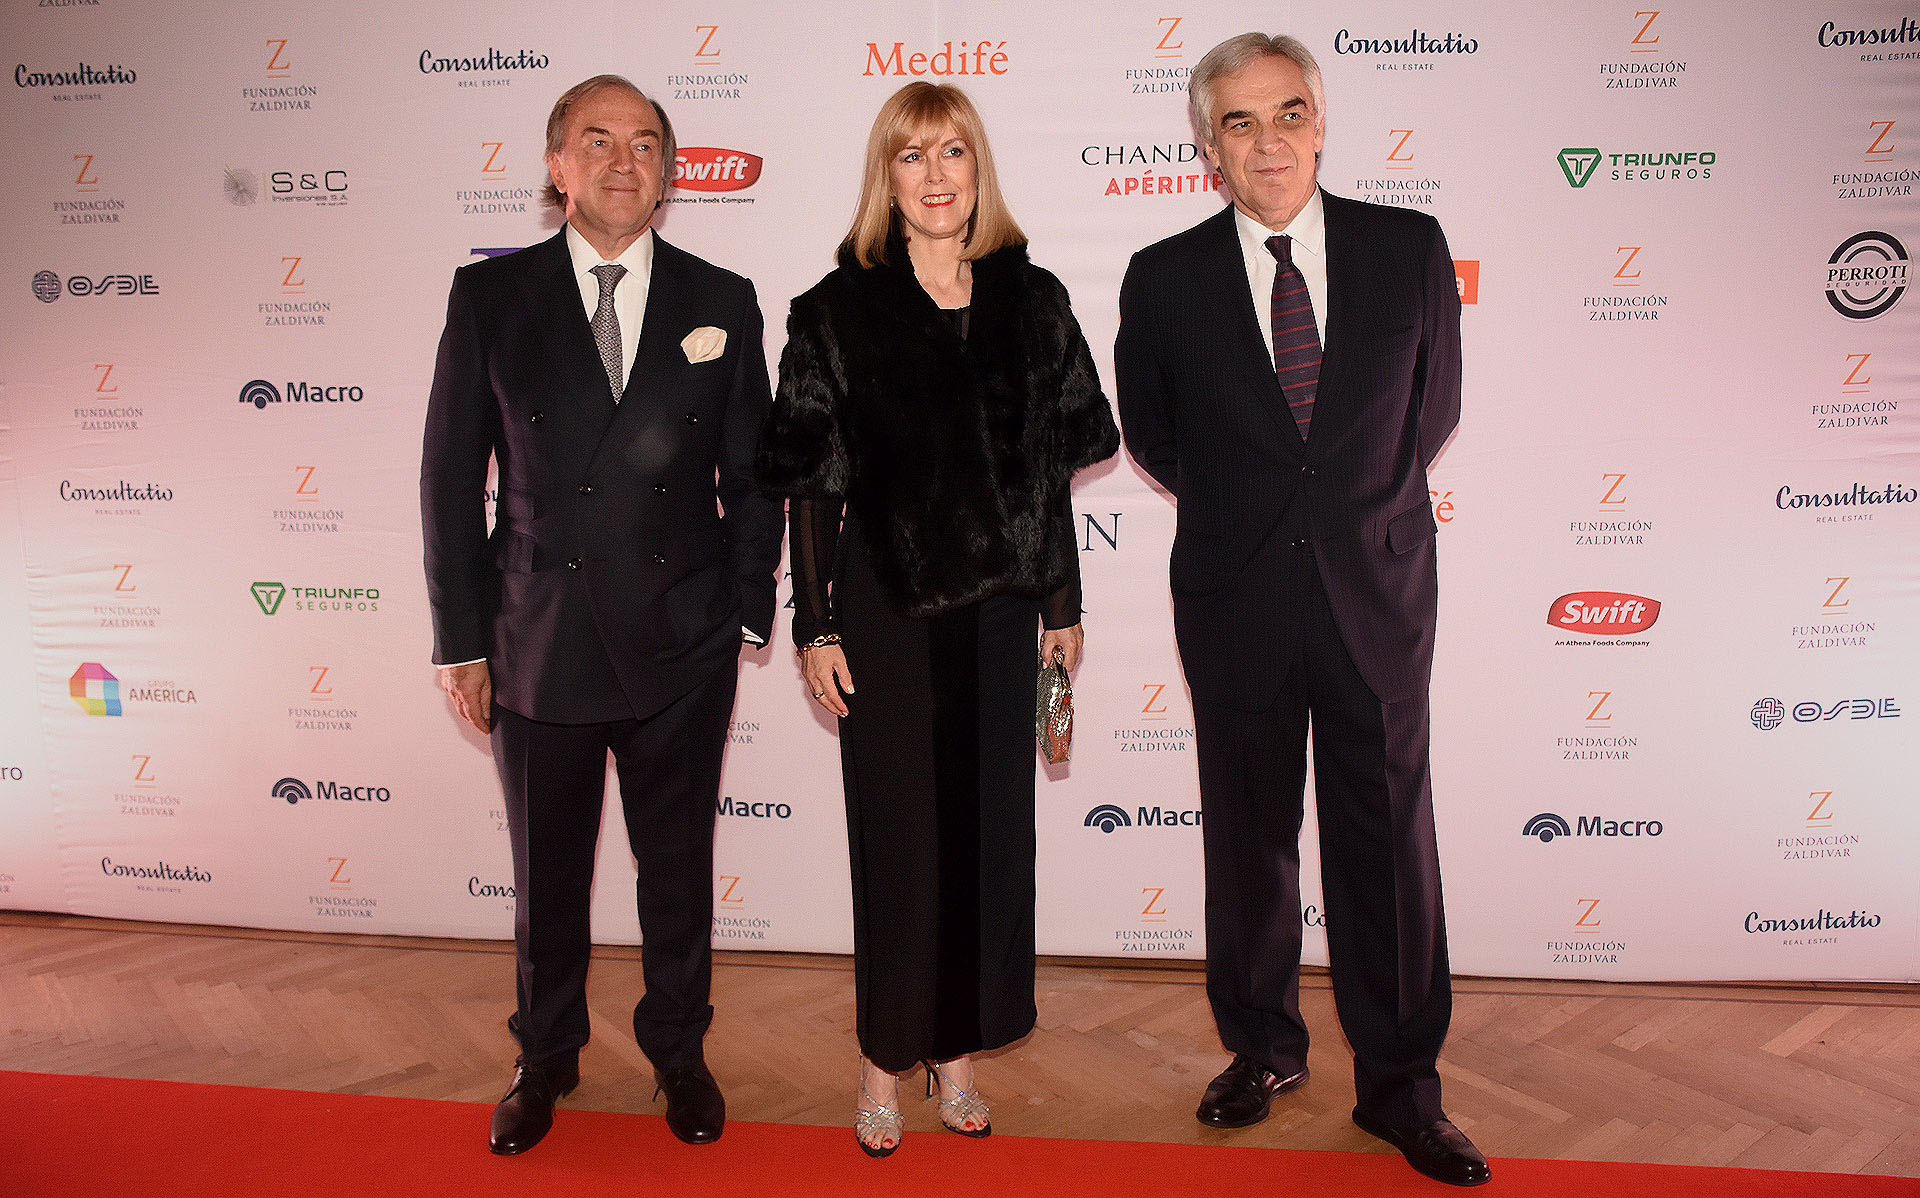 Roberto Zaldivar junto al embajador español, Javier Sandomingo y su esposa Meghan Sandomingo